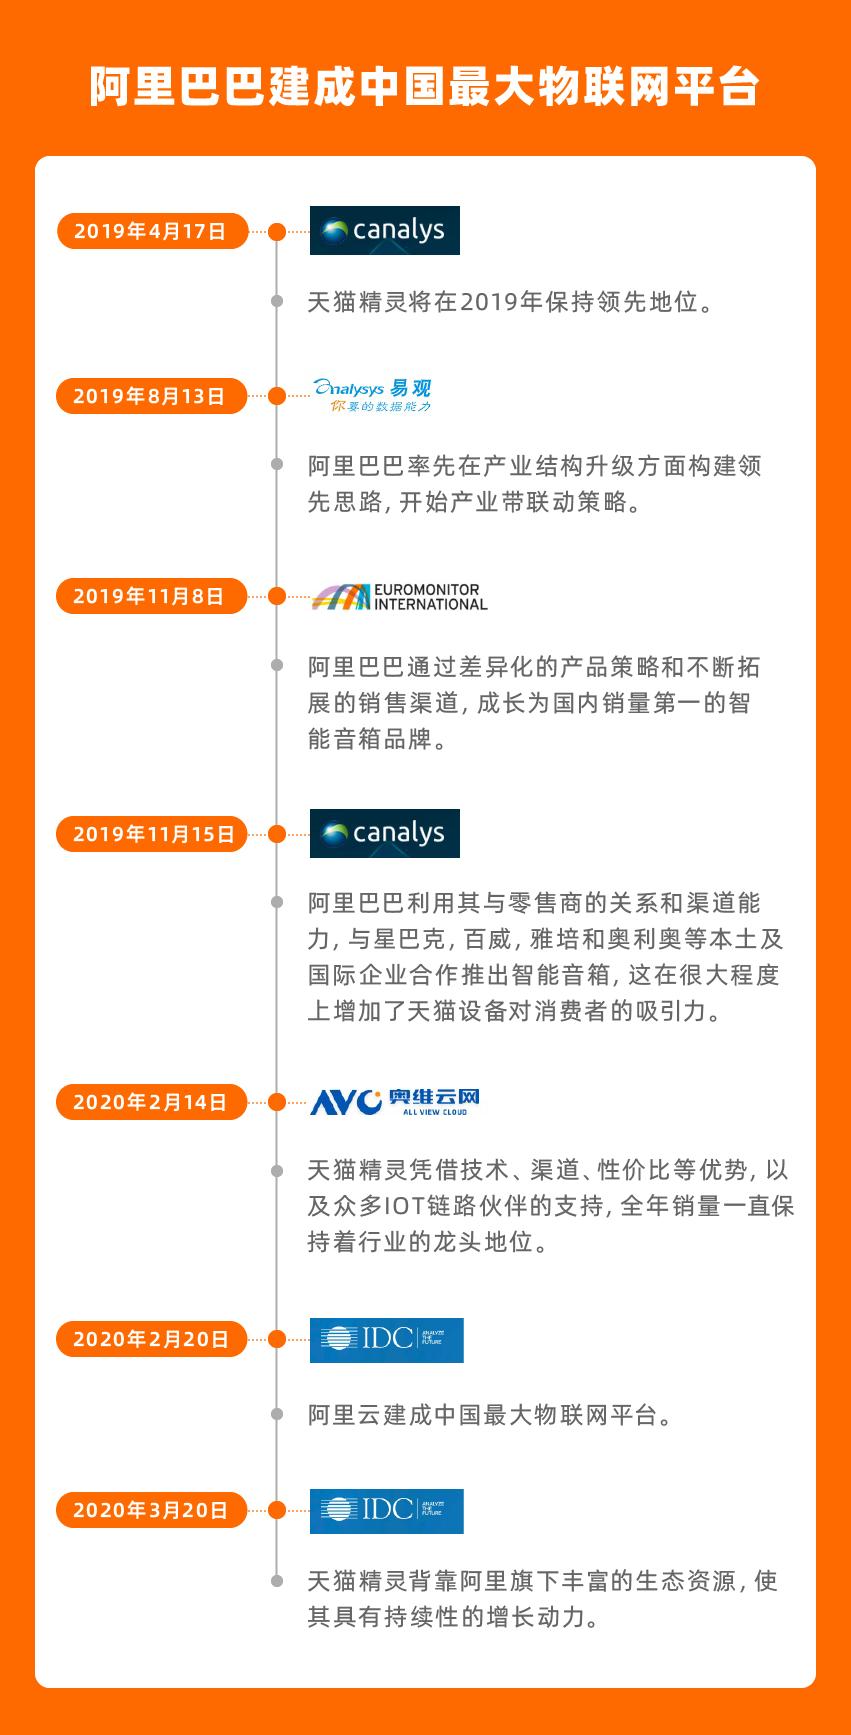 IDC发布中国智能音箱市场全年数据报告 天猫精灵出货量稳居中国市场第一